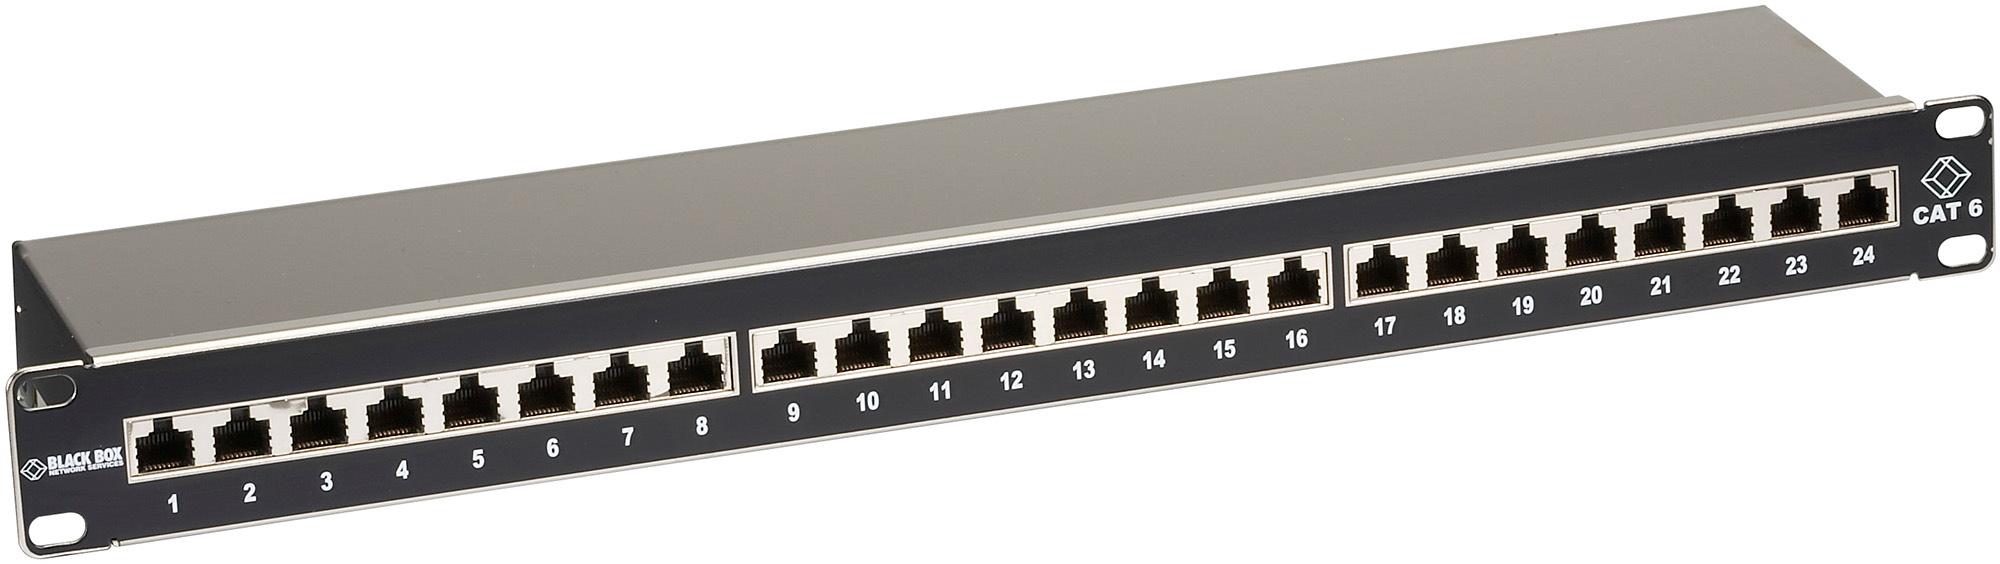 Black Box JPS60A-24 1U 24-Port CAT6 Shielded Patch Panel BBX-JPS60A-24